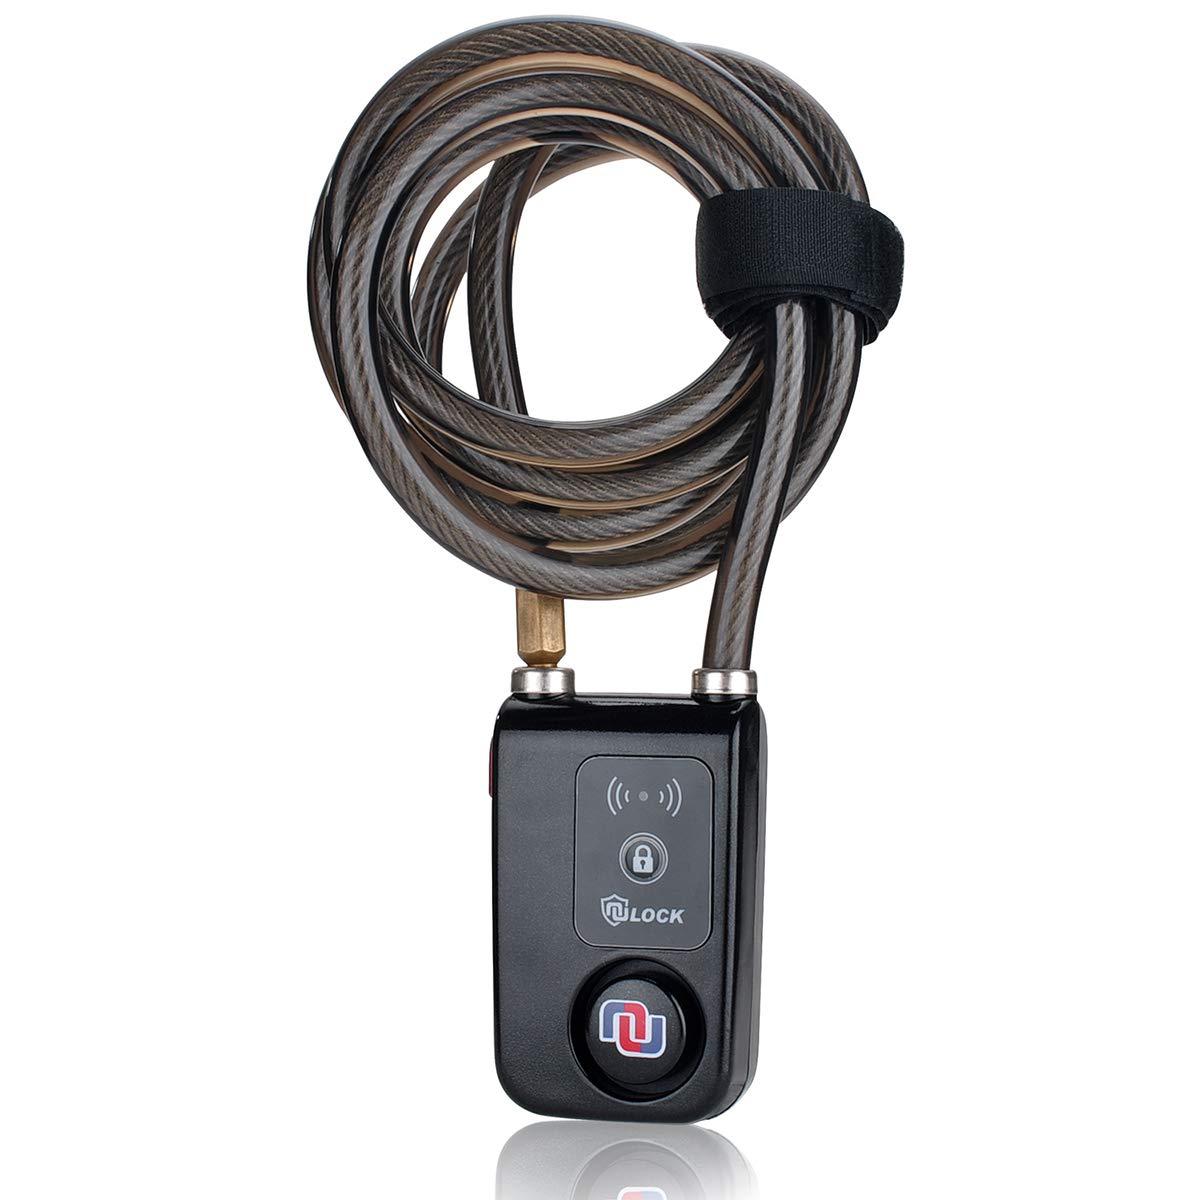 Nulock Keyless Bluetooth Bike/Motorcycle/Gate Lock IP44 Splash-Proof Cycling Lock with 110db Alarm, 0.38'' Diameter 71-inch Braided Steel Cable